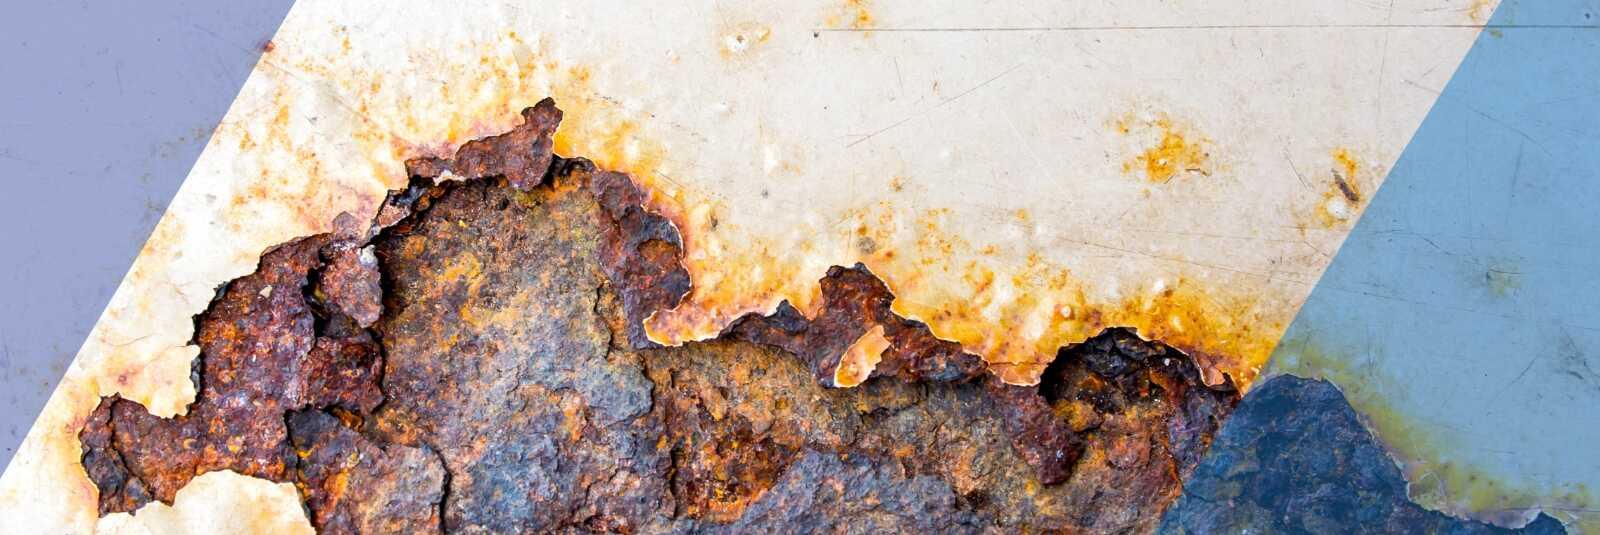 Corrosion Test & Paint Evaluation